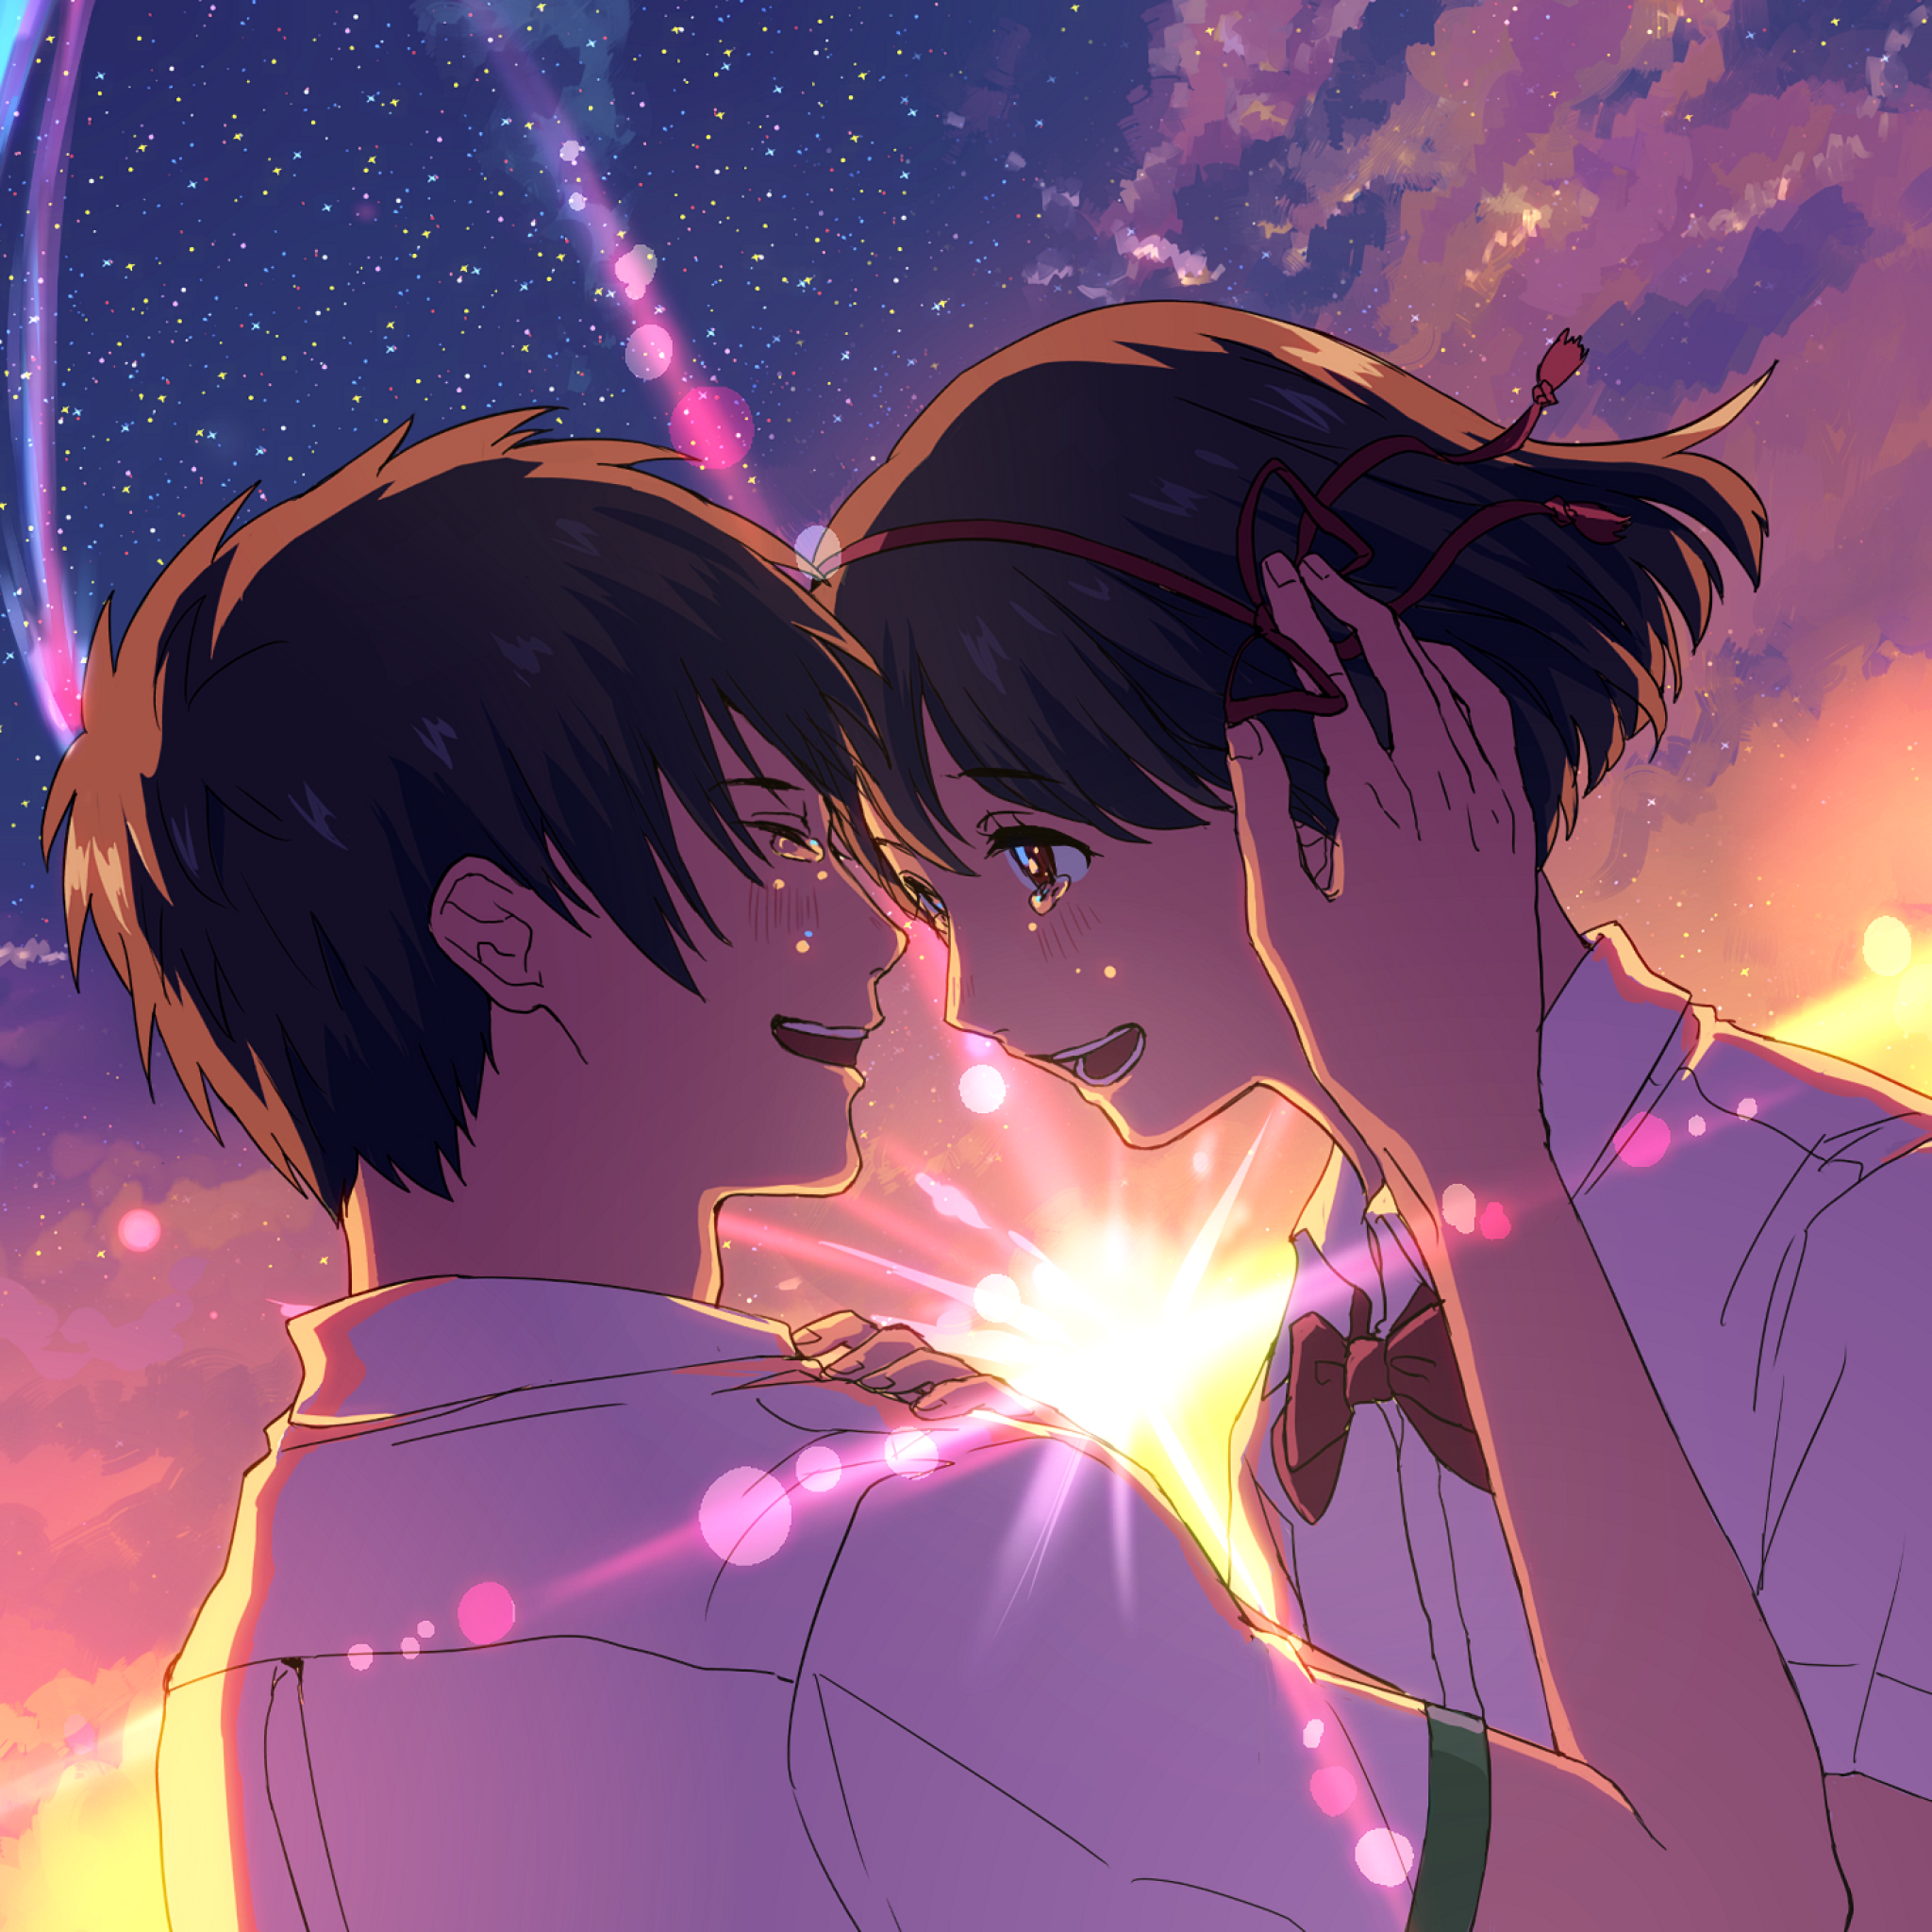 Love Story Tap To See More Cute Anime Love Romantic Wallpapers Mobile9 Kimi No Na Wa Wallpaper Your Name Anime Kimi No Na Wa